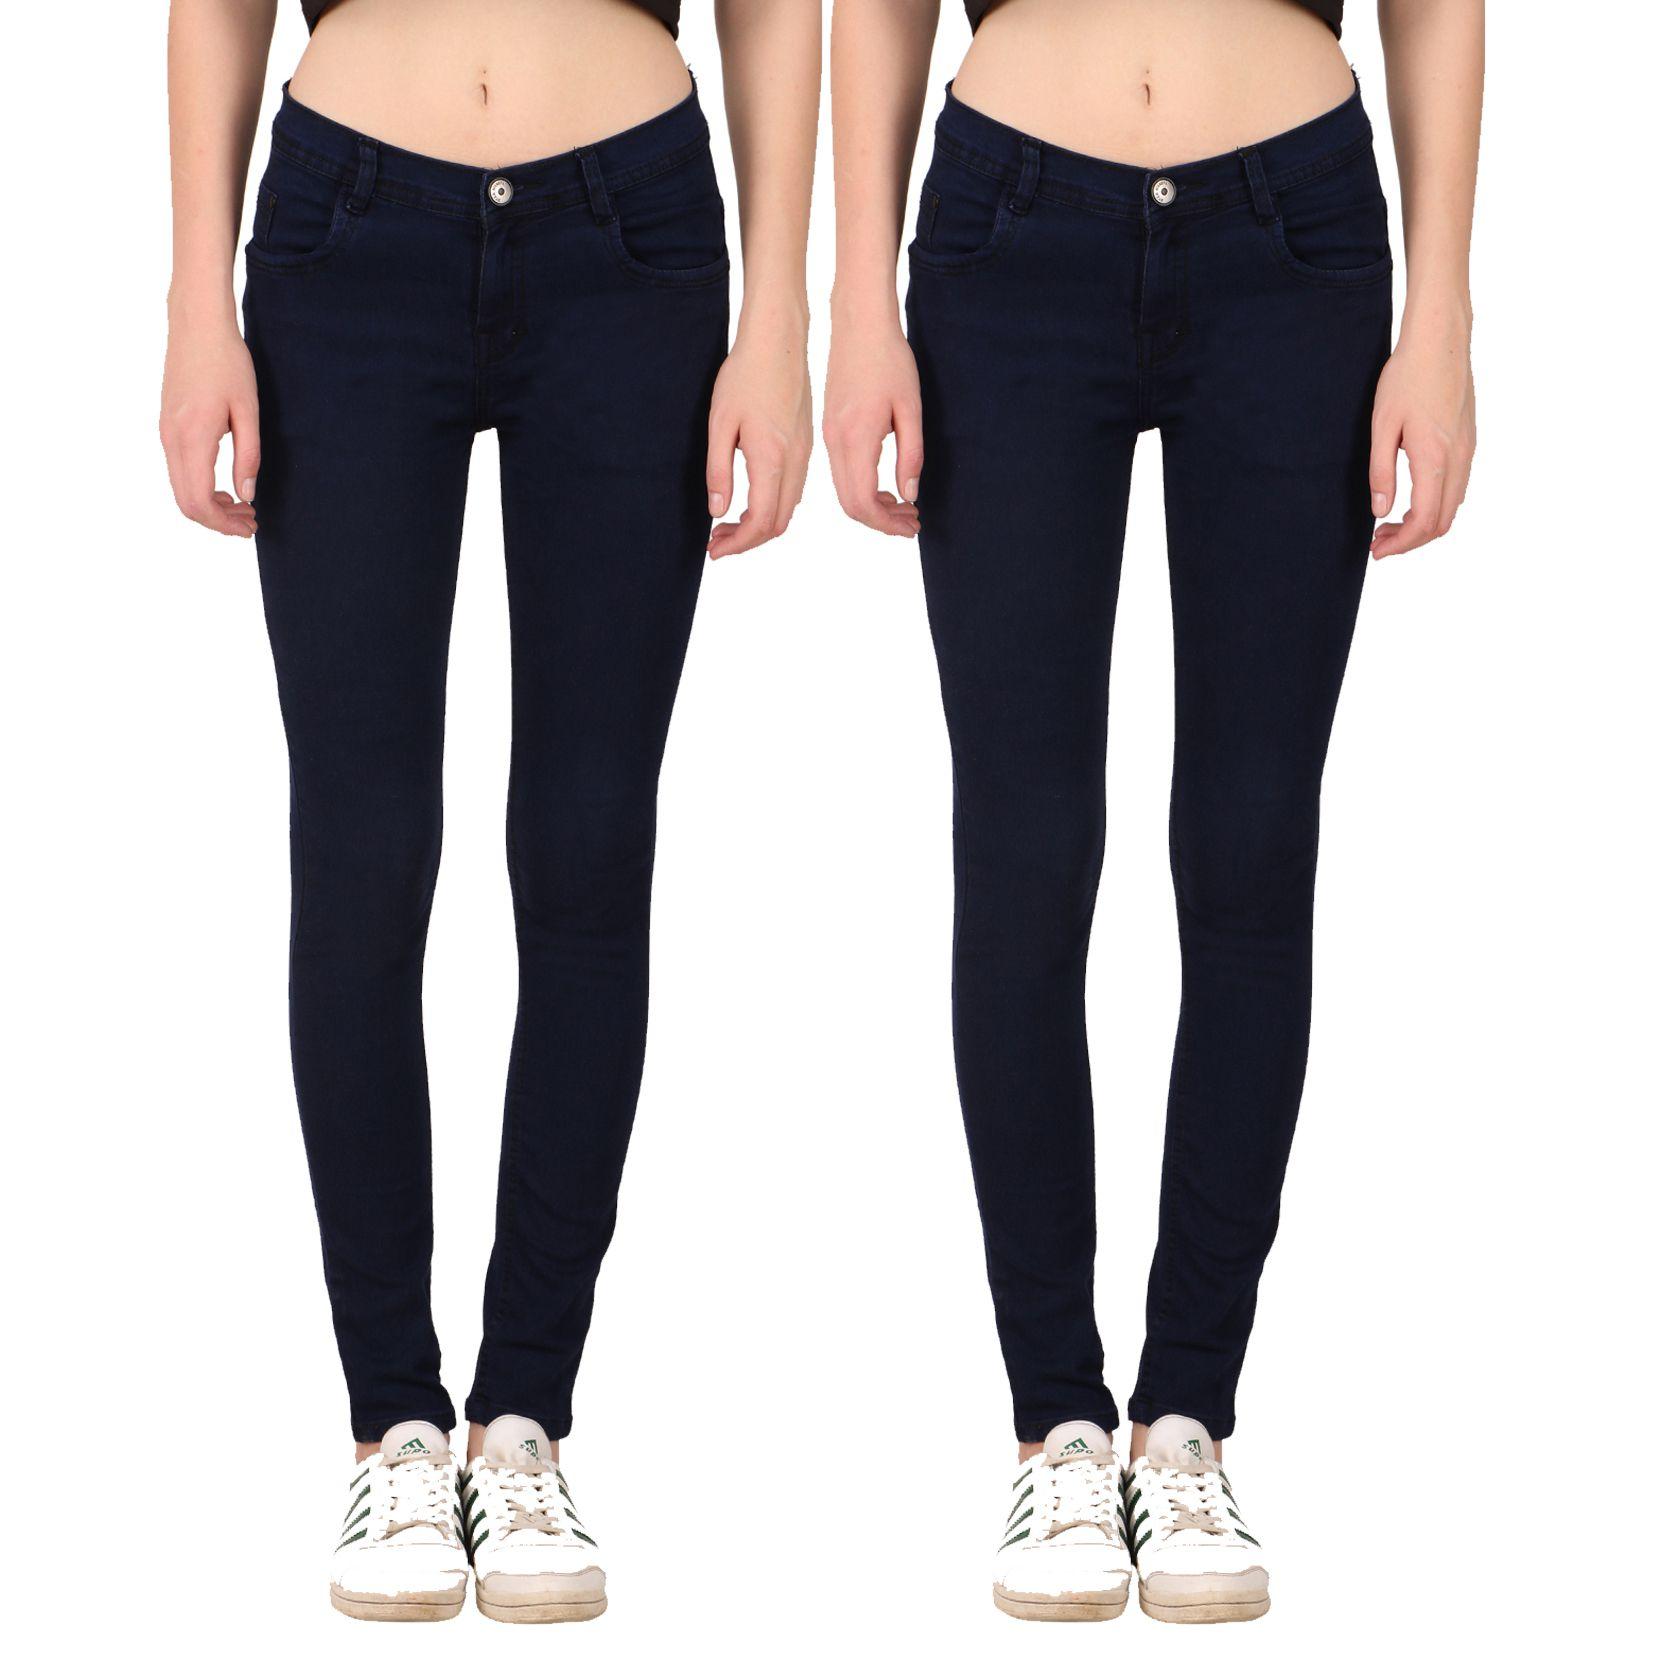 KA Fashion Denim Jeans - Multi Color